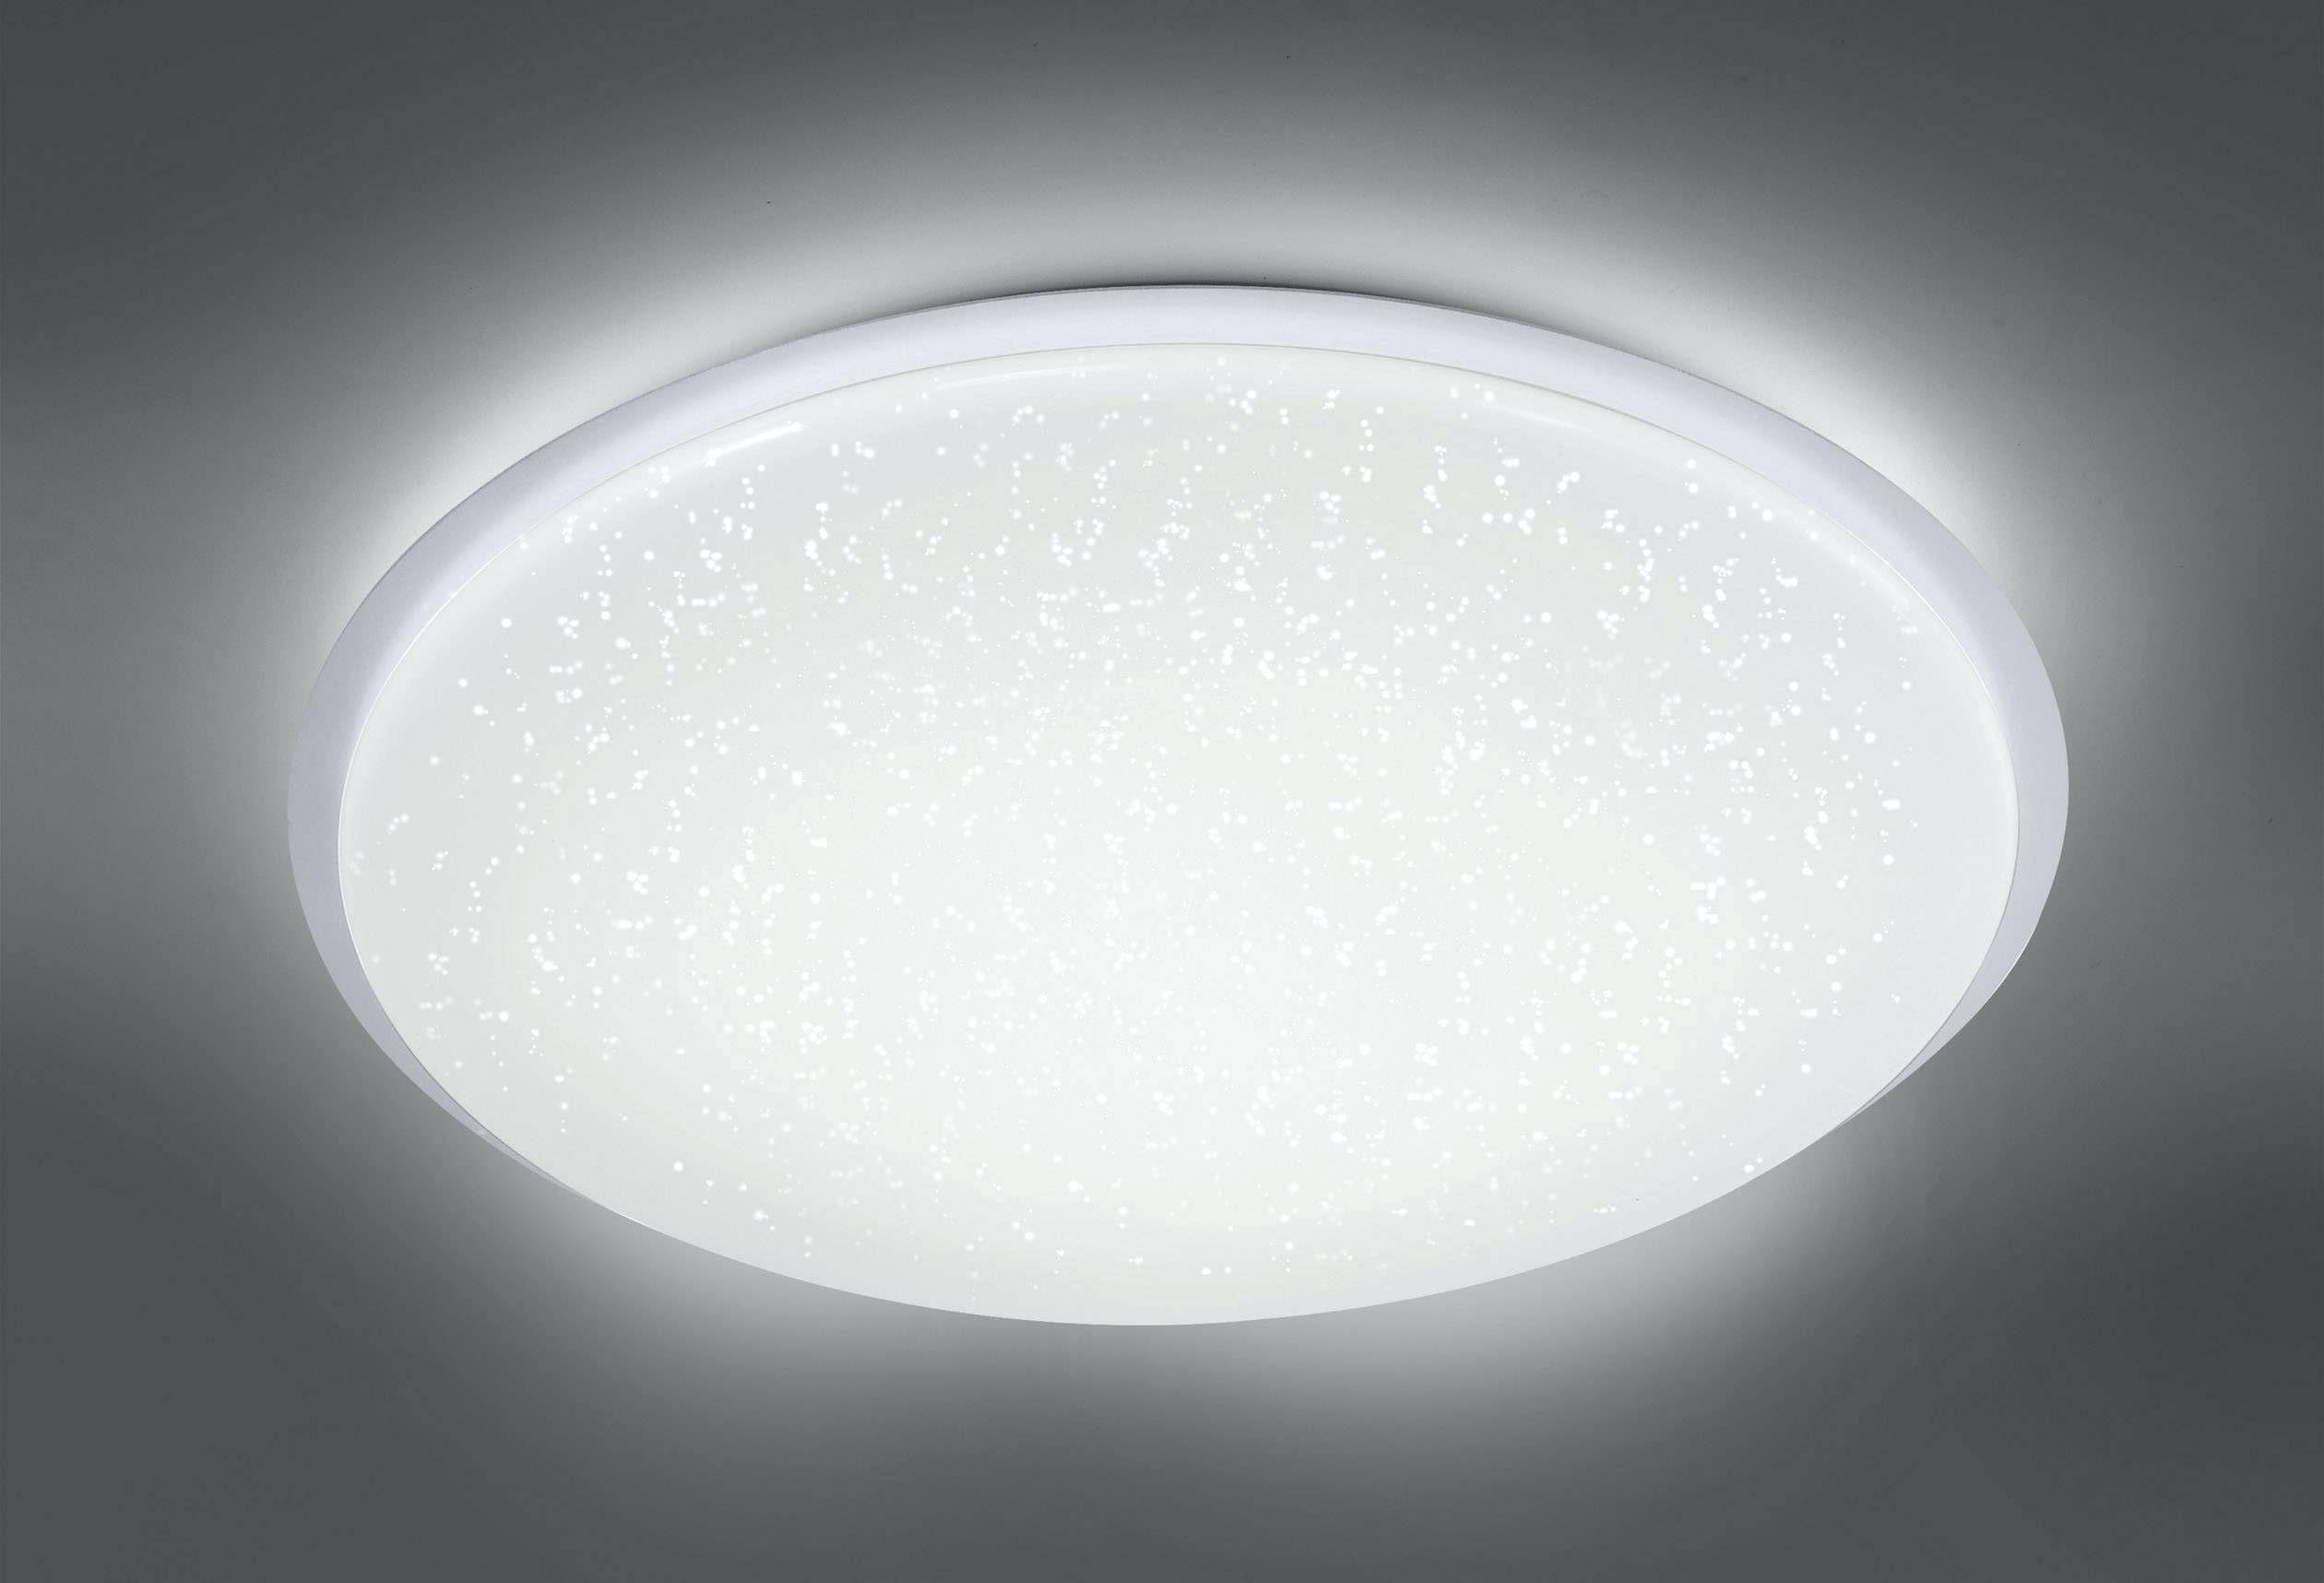 Tageslicht Deckenlampe Led Panel 1 4 Dimmbar Obi Buro Wohnzimmerlampe Di 2020